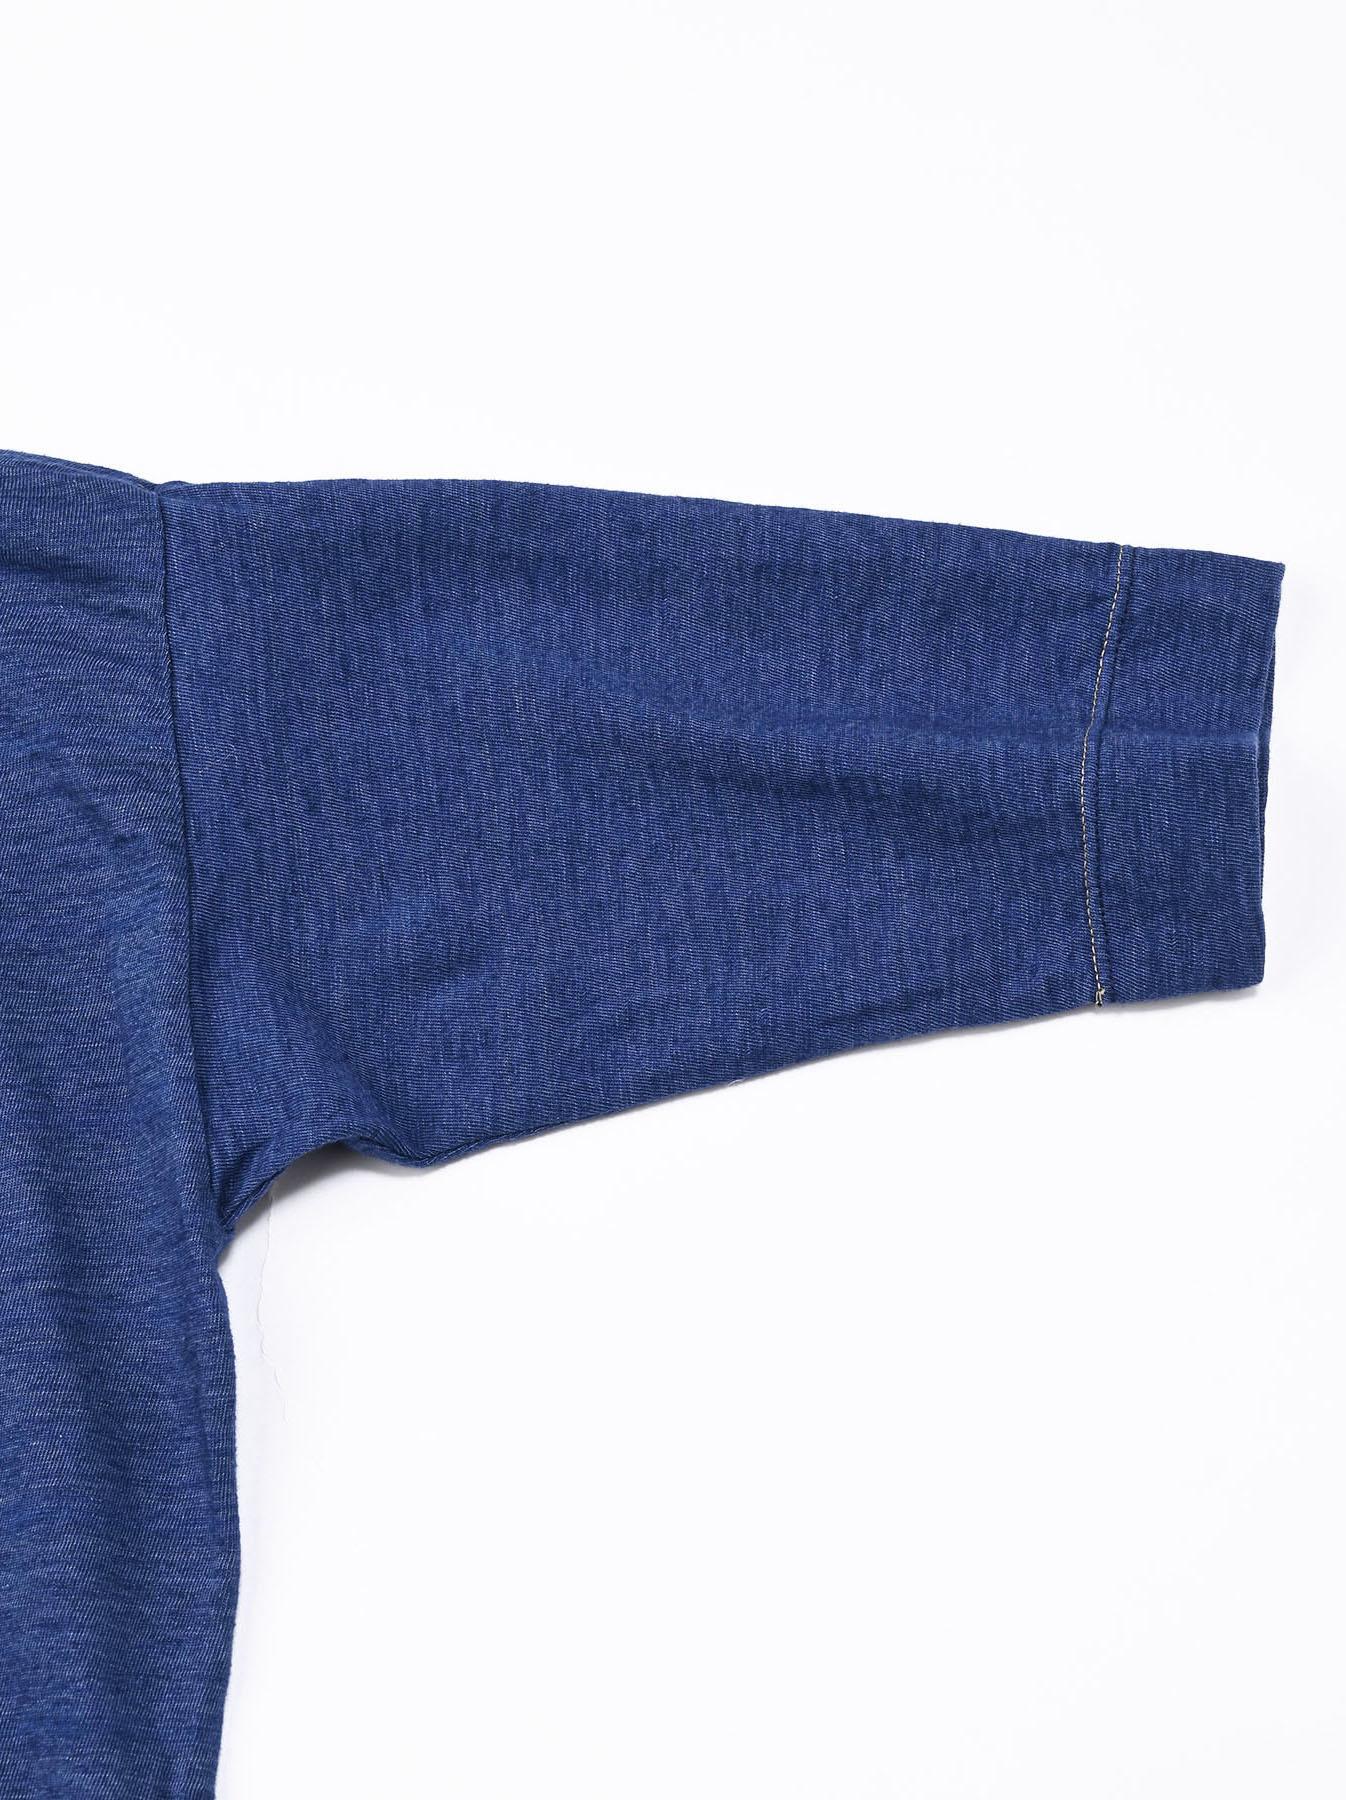 Distressed Indigo Lei Lei Print Big Slit T-shirt (0621)-10